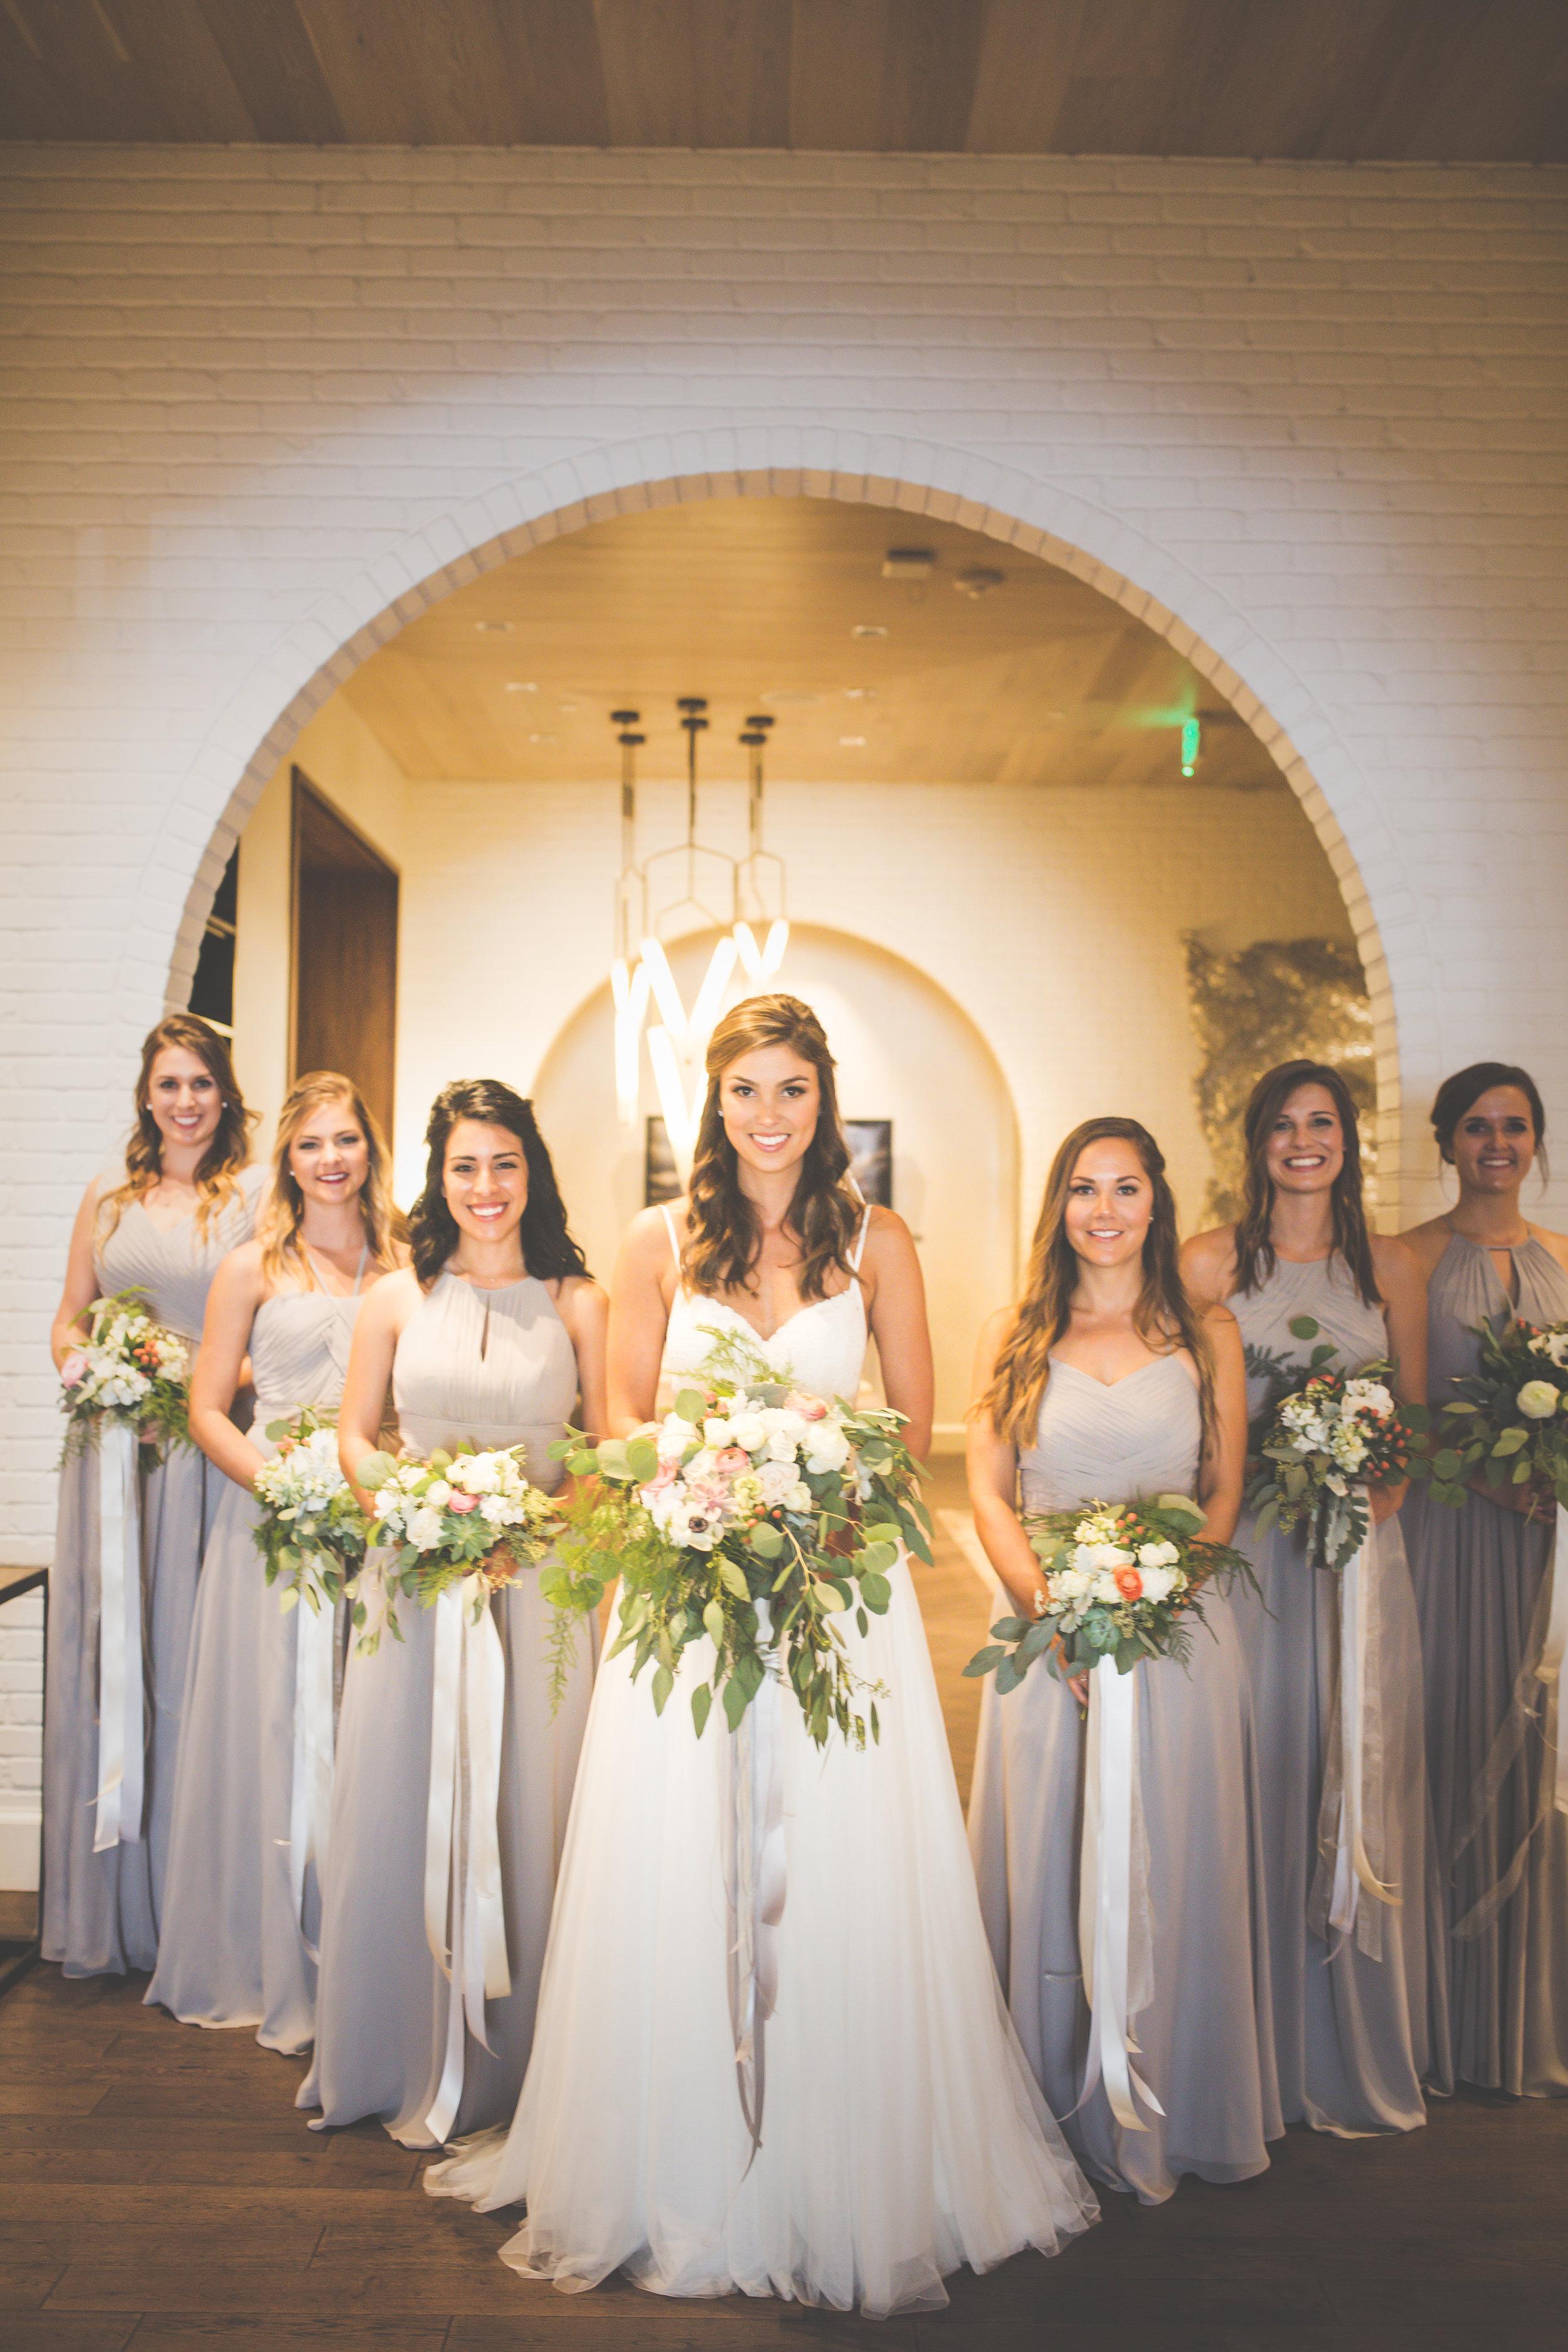 Bridesmaids-21.jpg